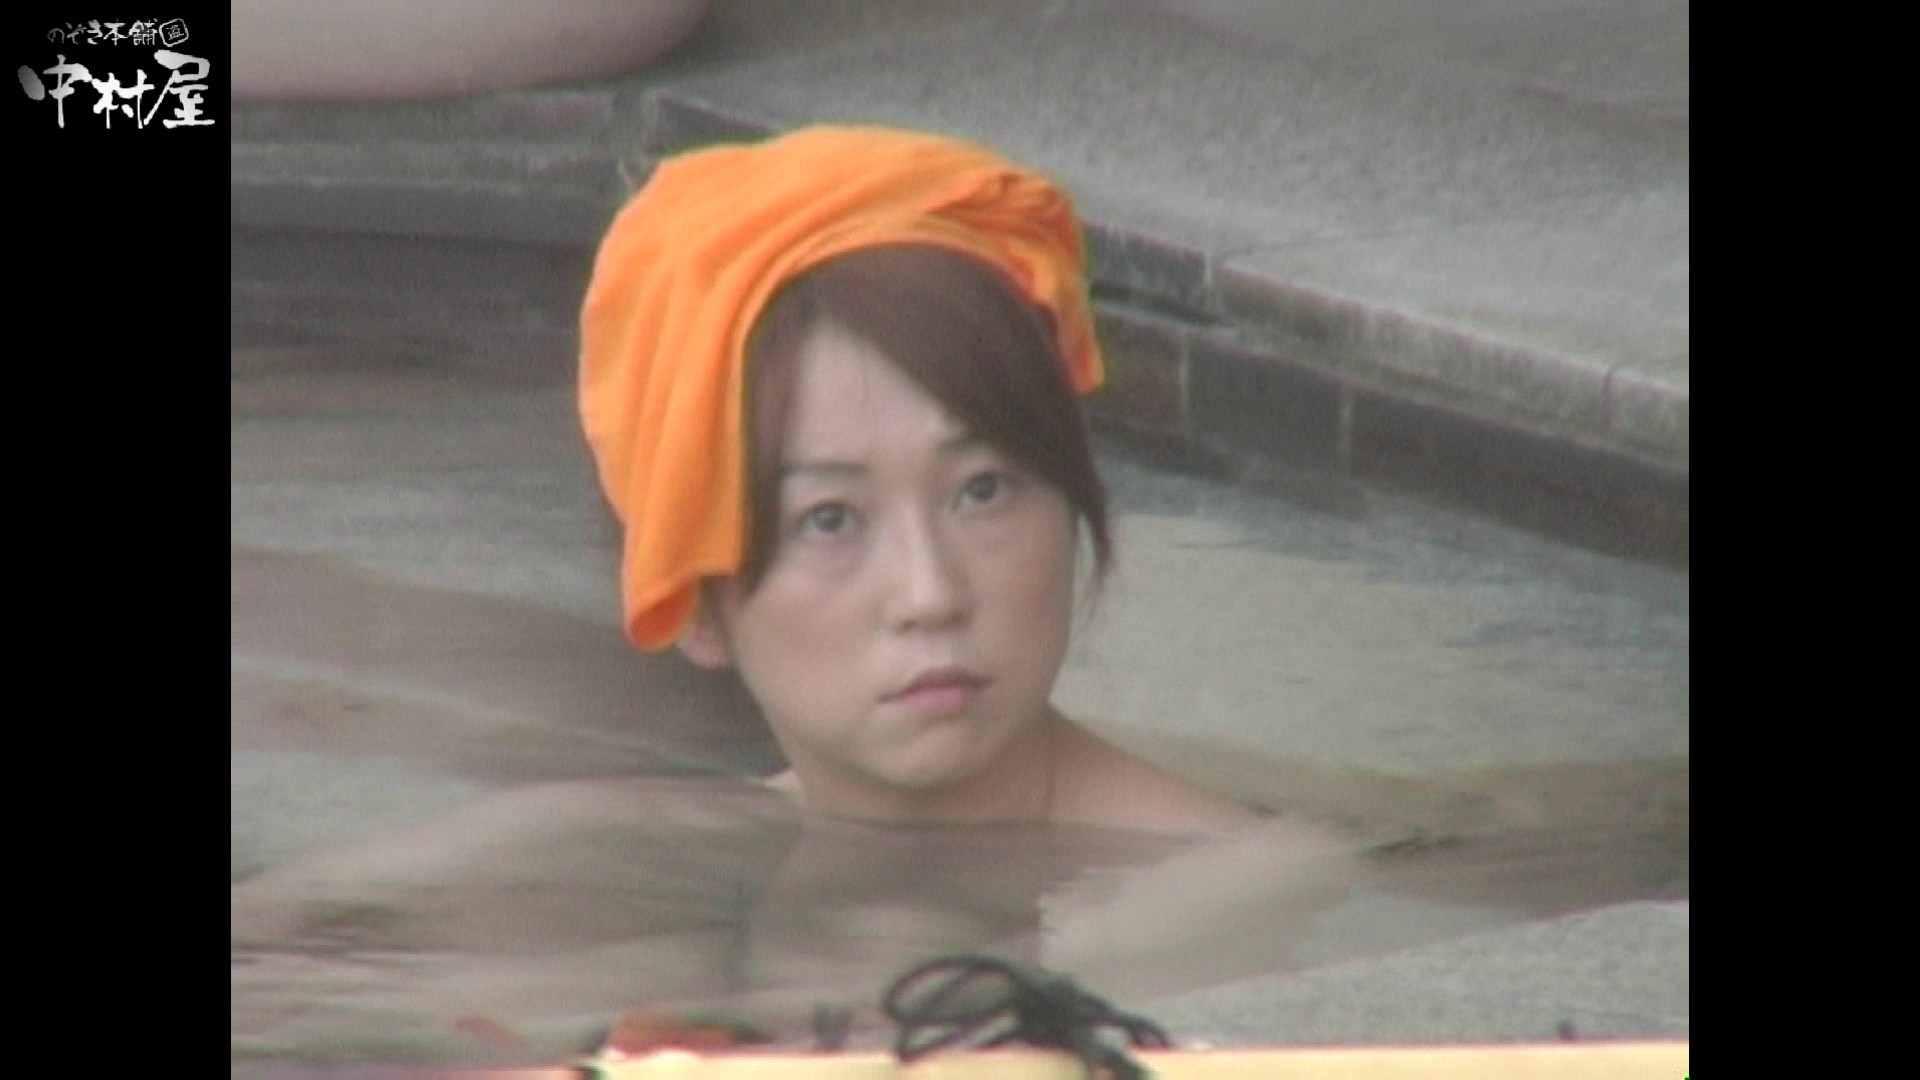 Aquaな露天風呂Vol.941 盗撮師作品  76pic 42